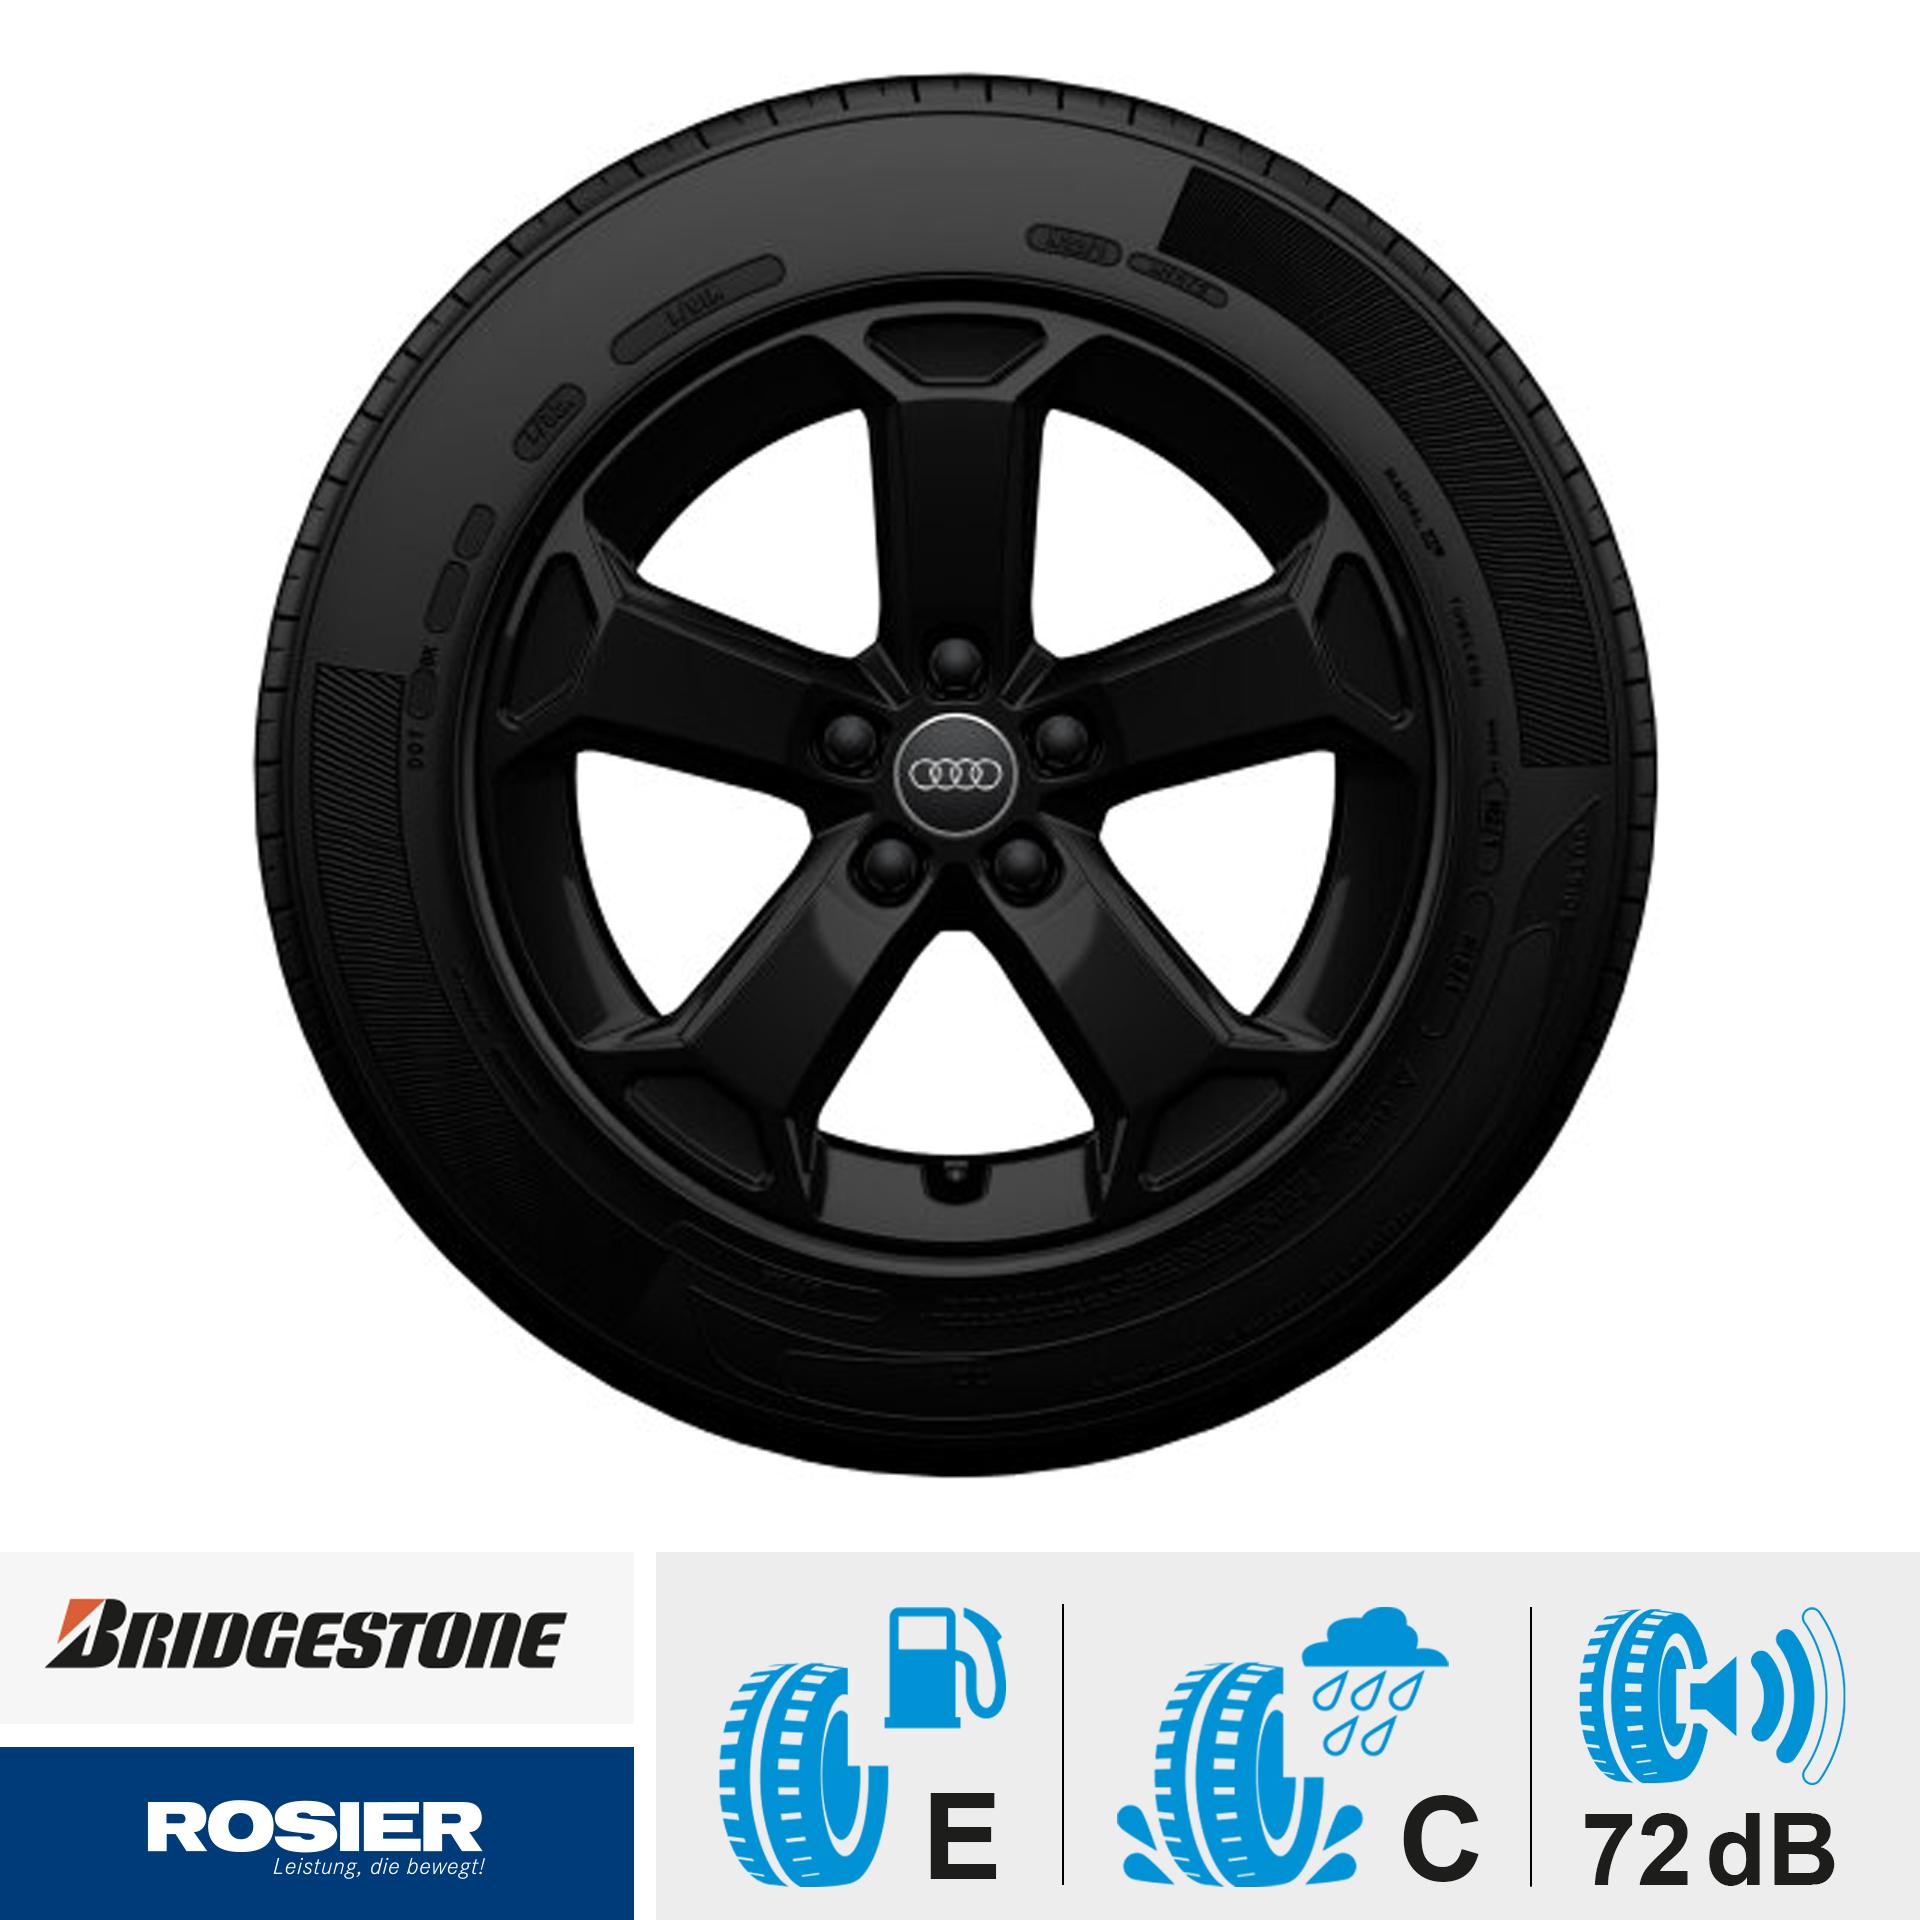 Winterkomplettrad - 5-Arm-Design schwarz 215/55 R17 94V Bridgestone Blizzak LM001 AO für Audi Q2